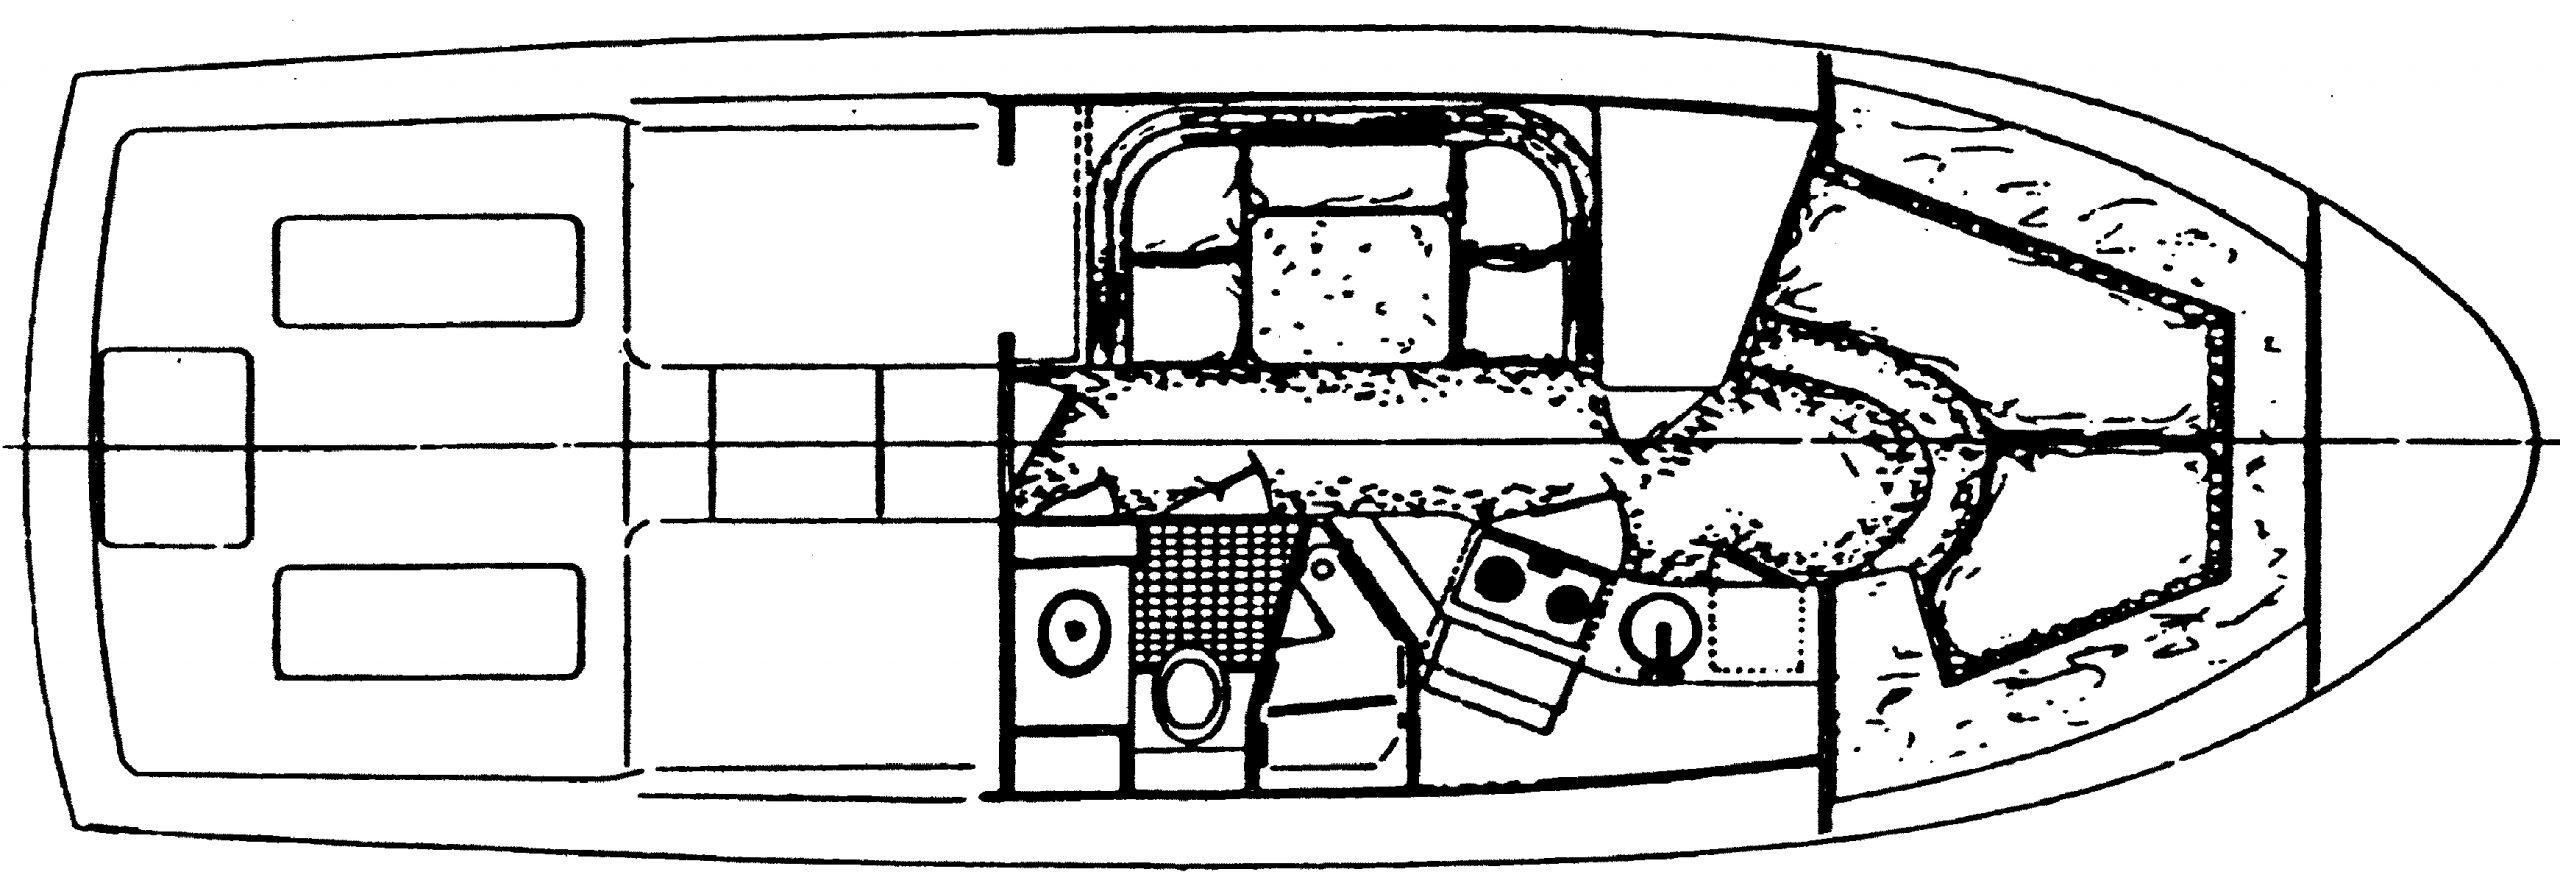 Blackfin 33 Convertible Floor Plan 2